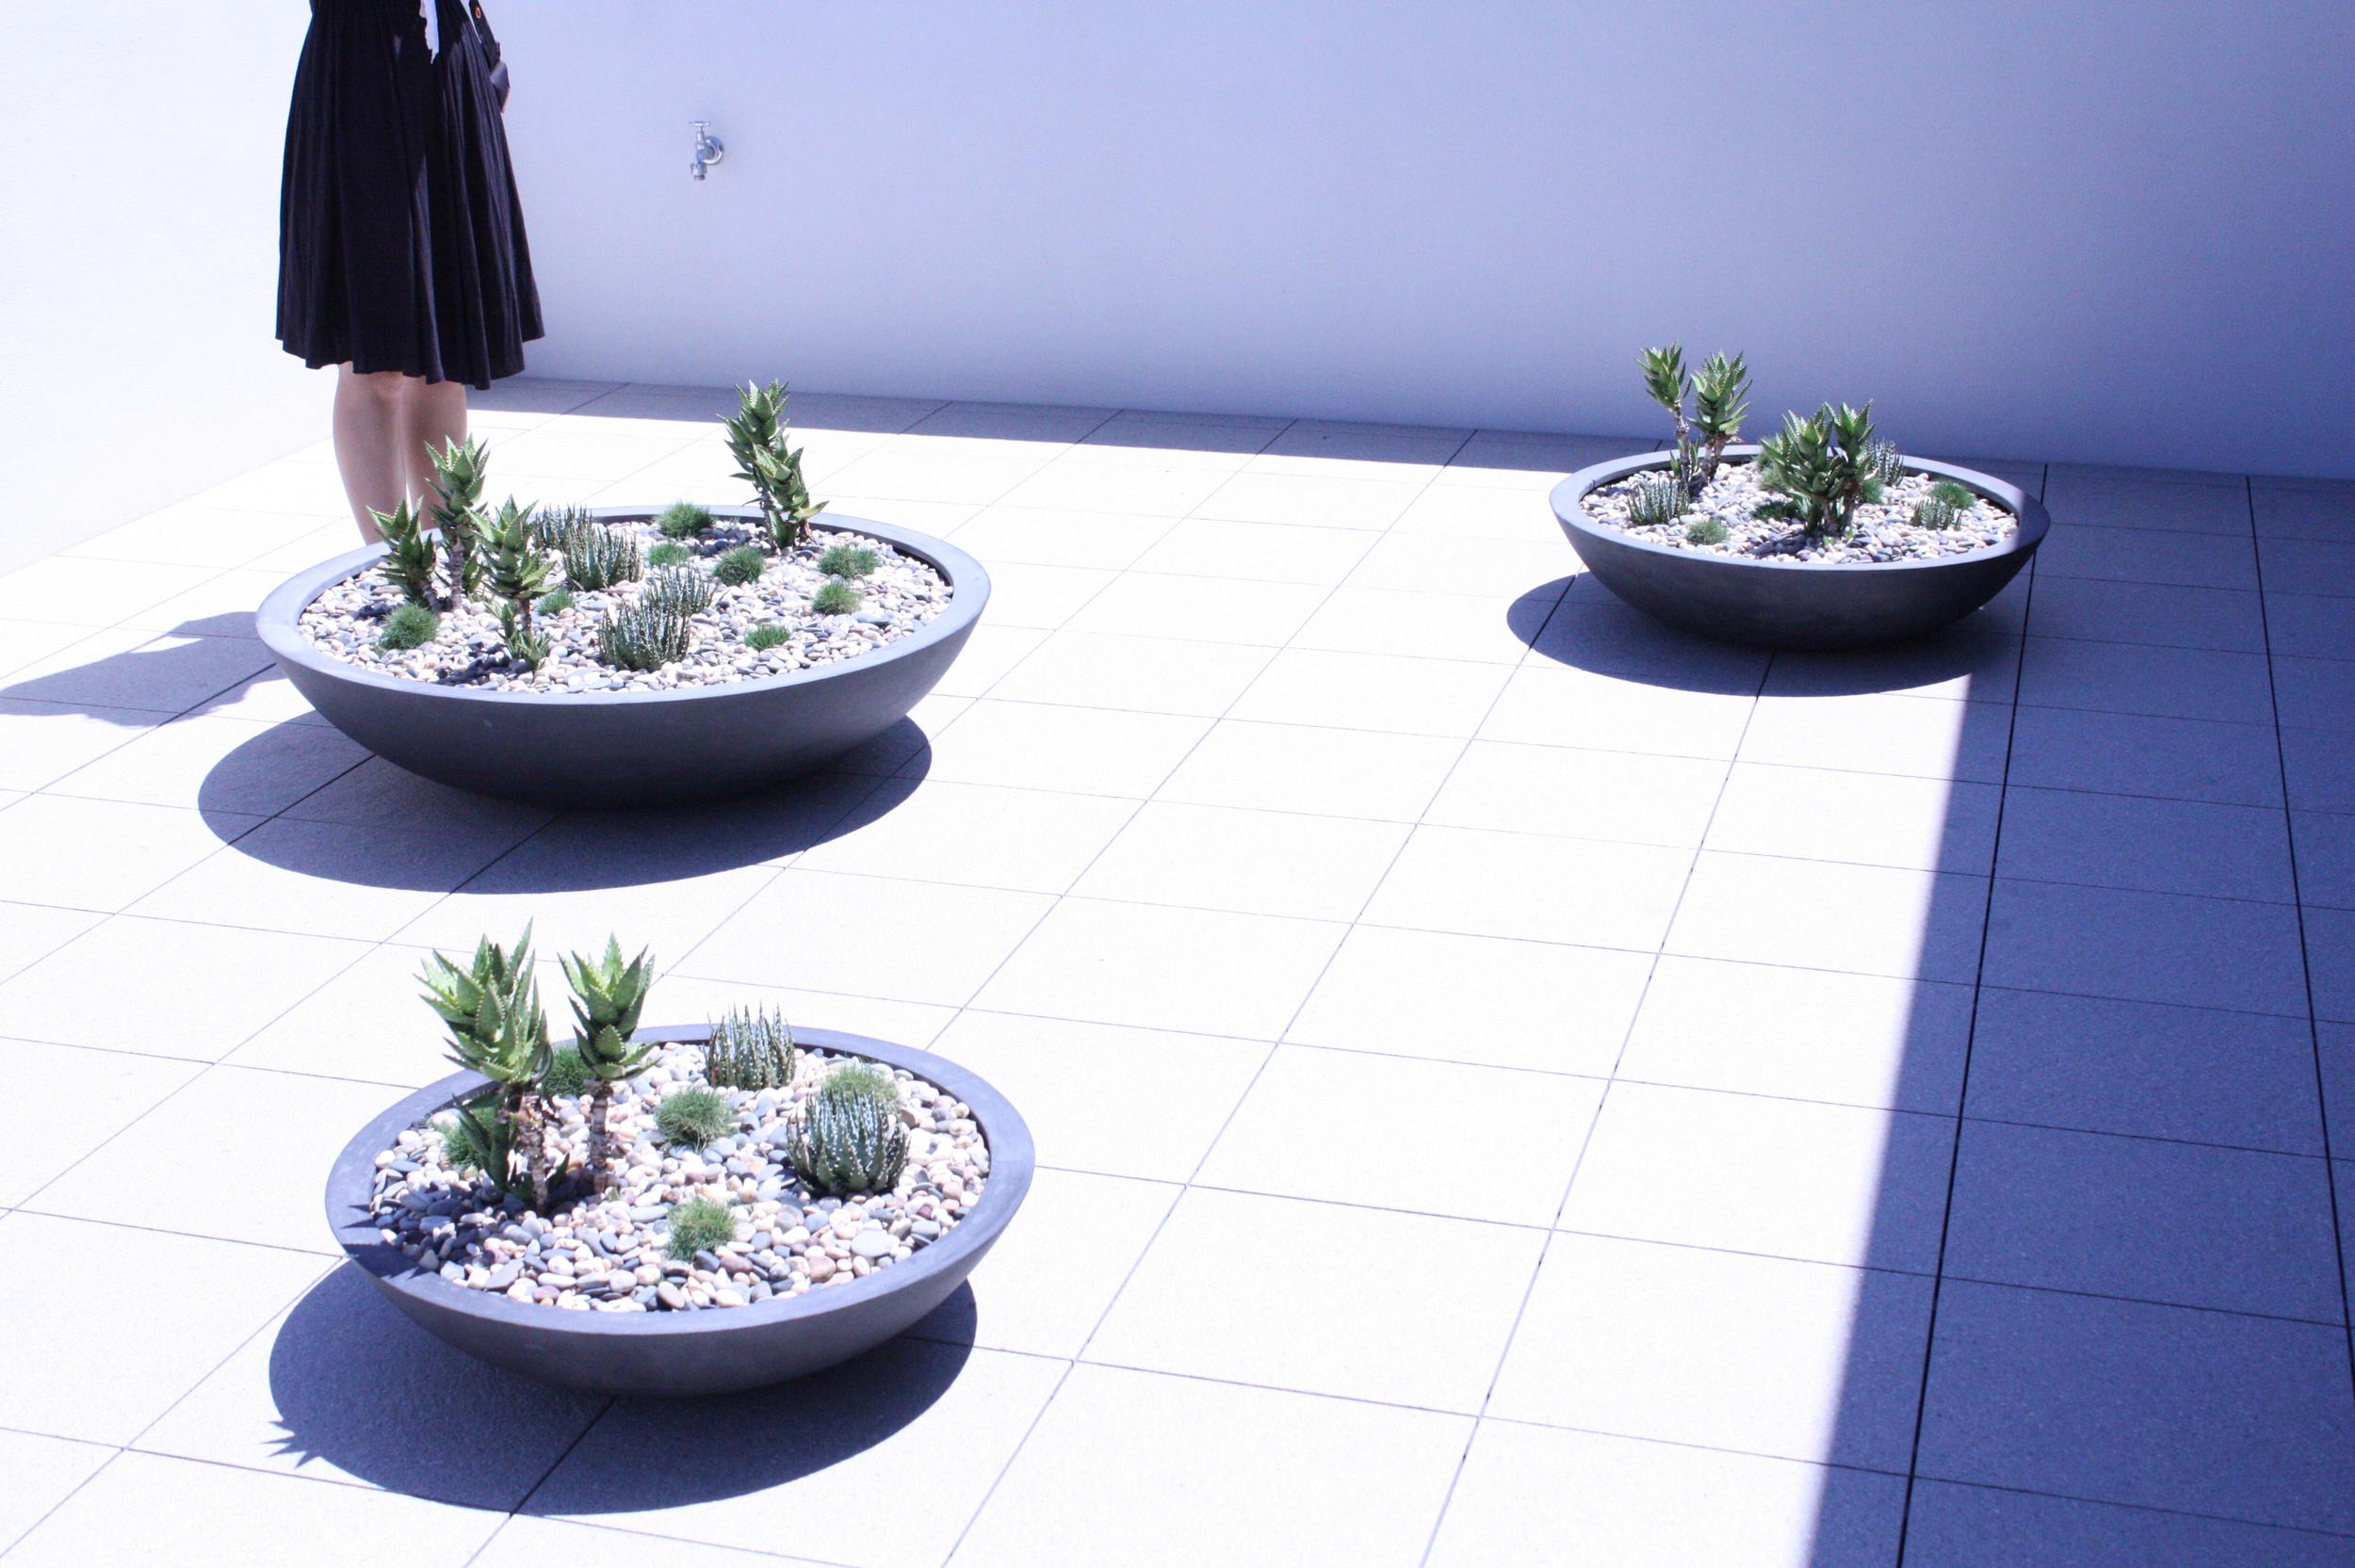 hamilton-rooftop-landscape-design-SEED6.JPG